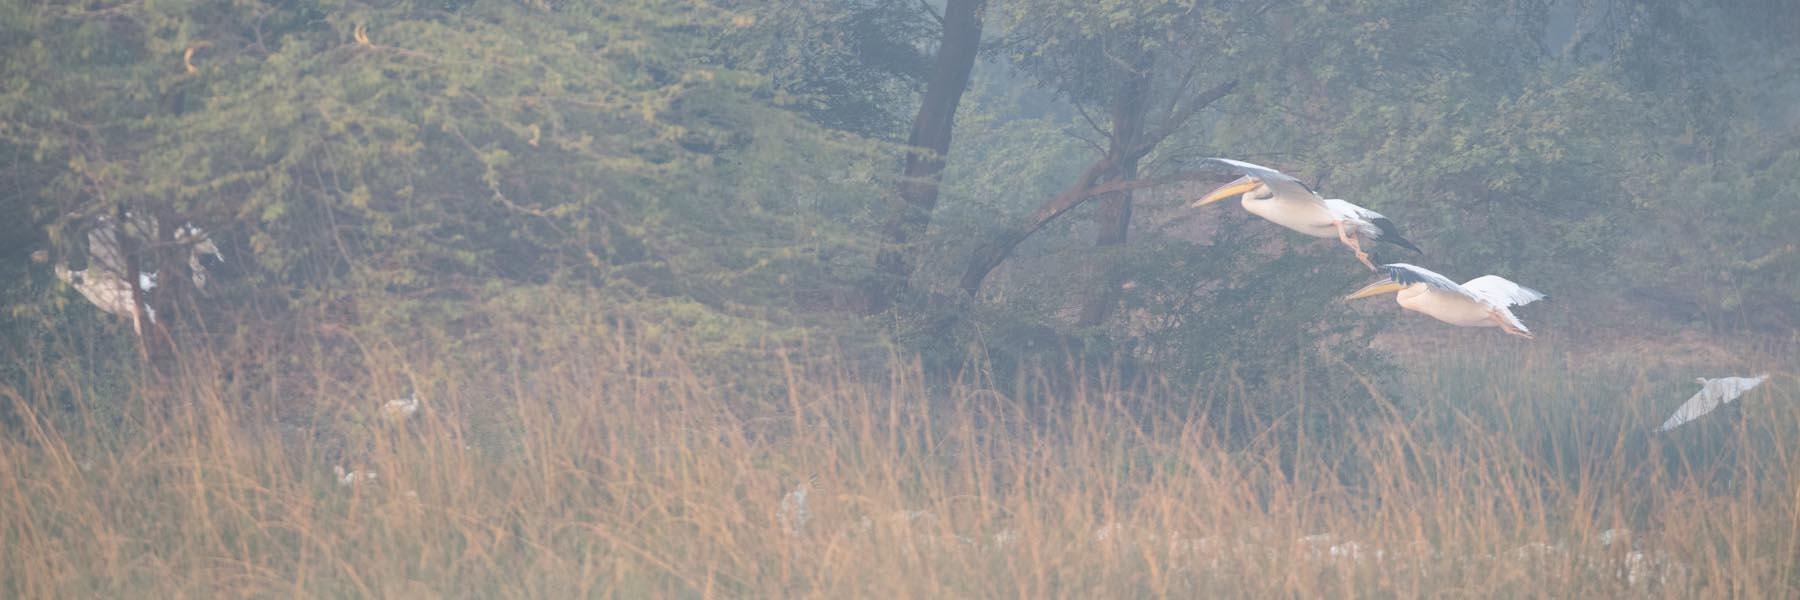 Jamnagar Birding